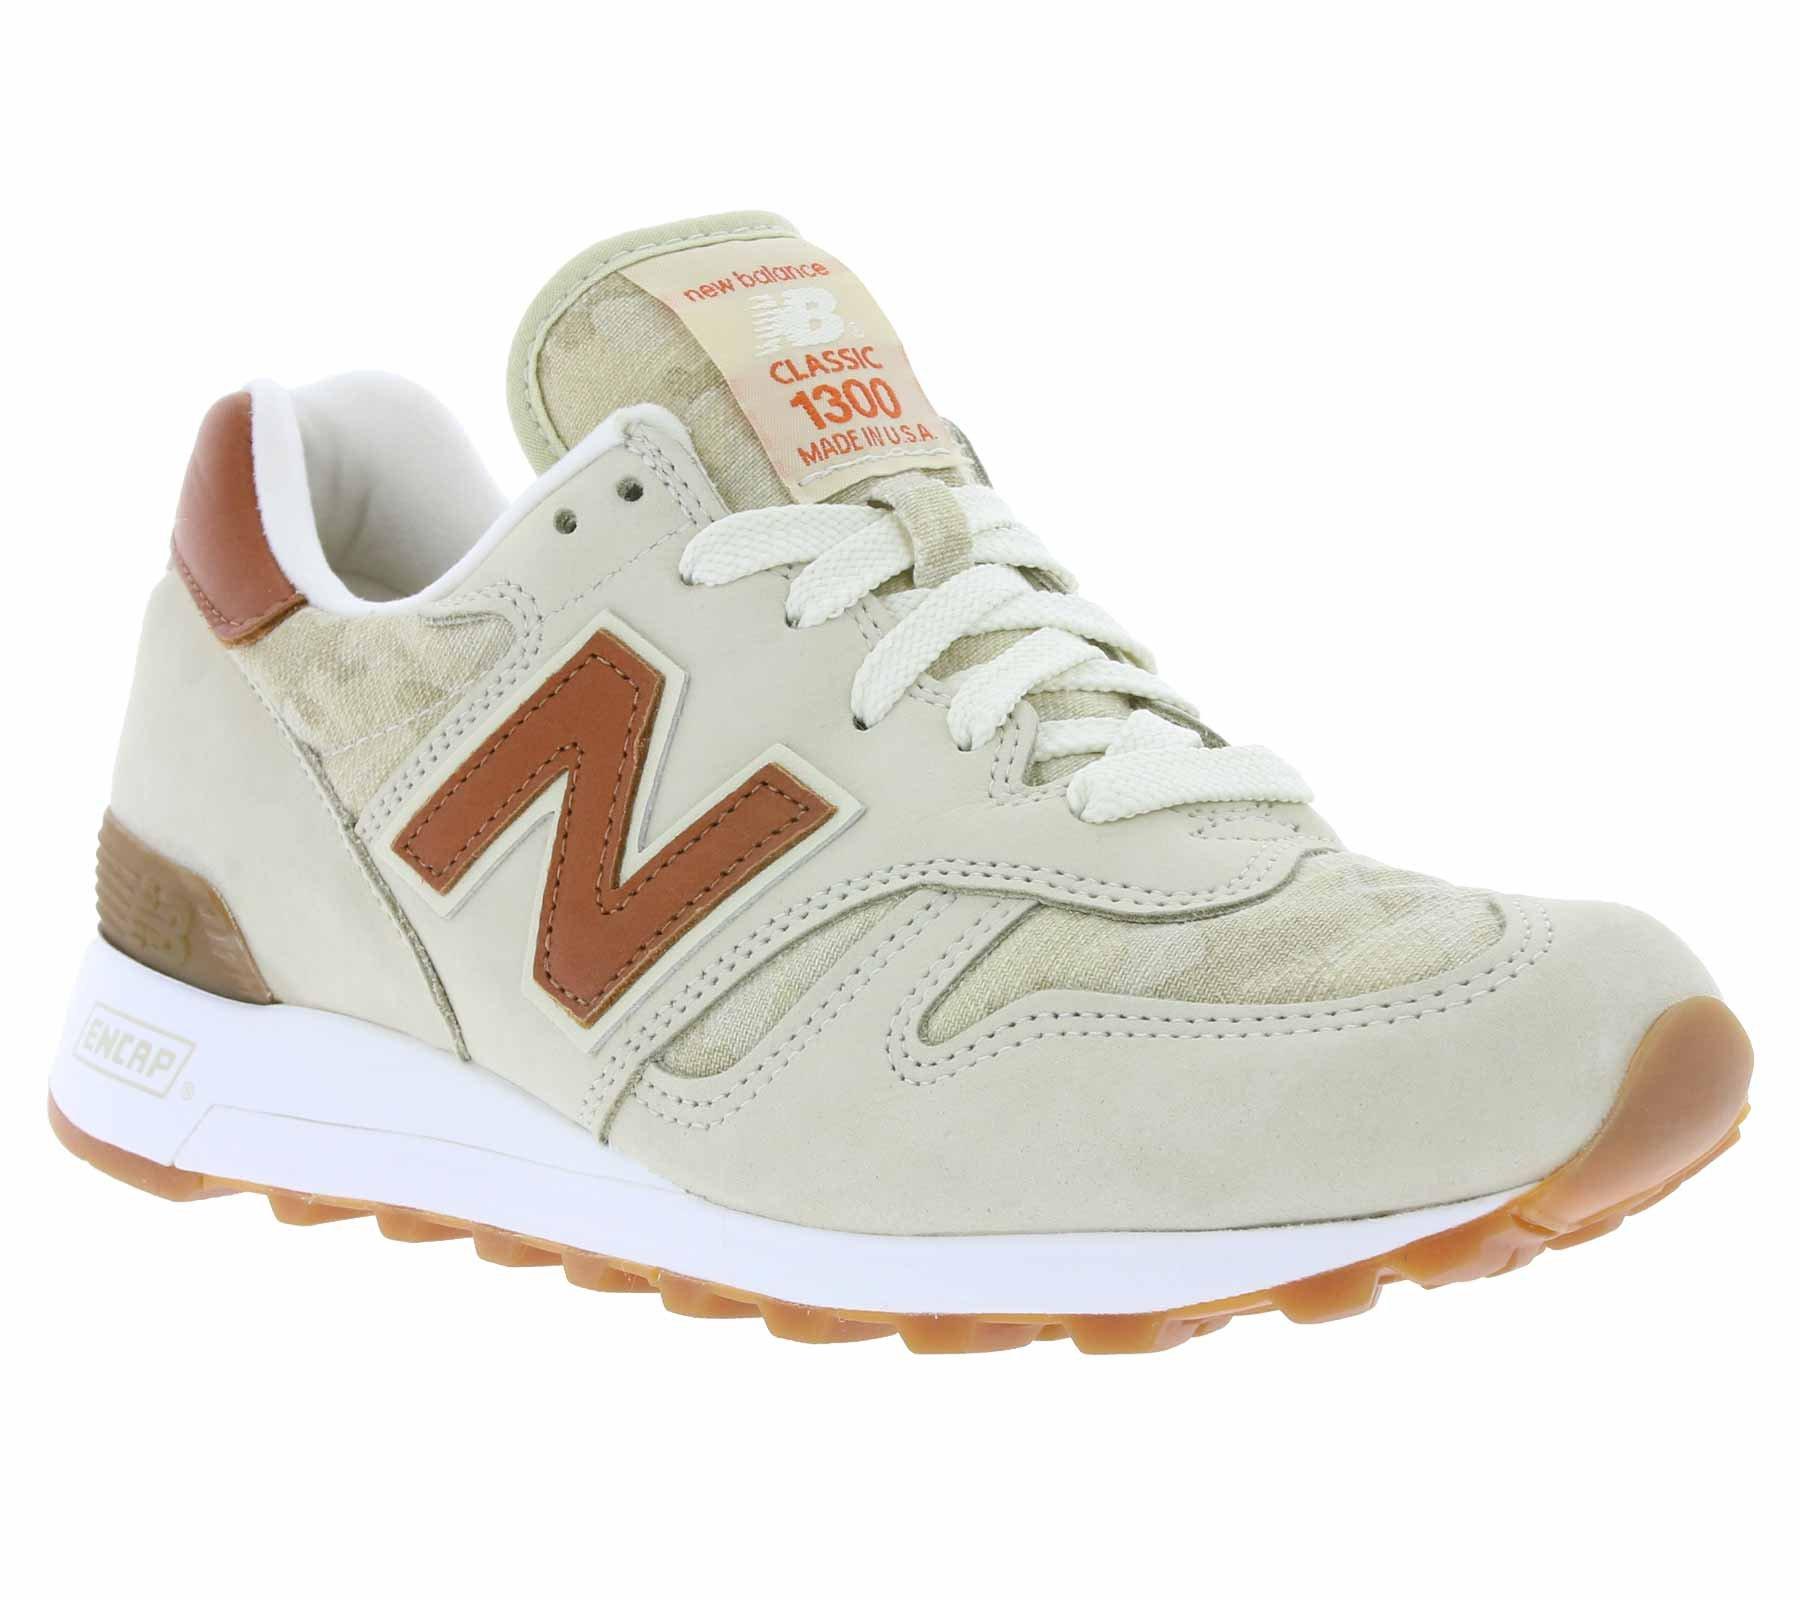 New Balance 1300 Made in USA Age Of Exploration Schuhe Herren Sneaker Turnschuhe Beige M1300DSP, Größenauswahl:40